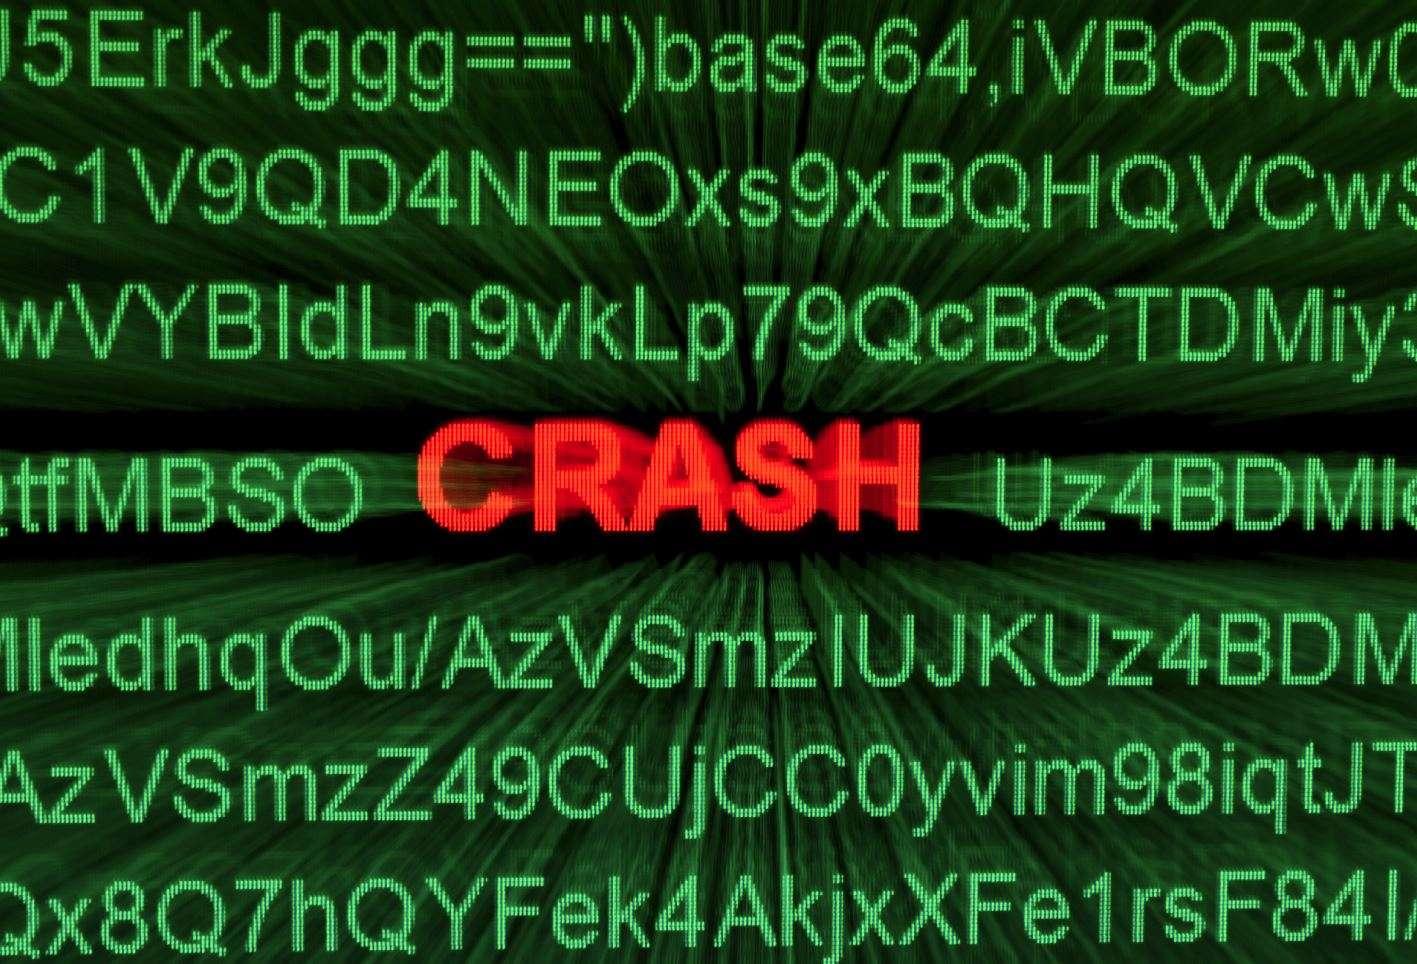 Crash-proof computers on the way? (photo credit: graphicstock.com)